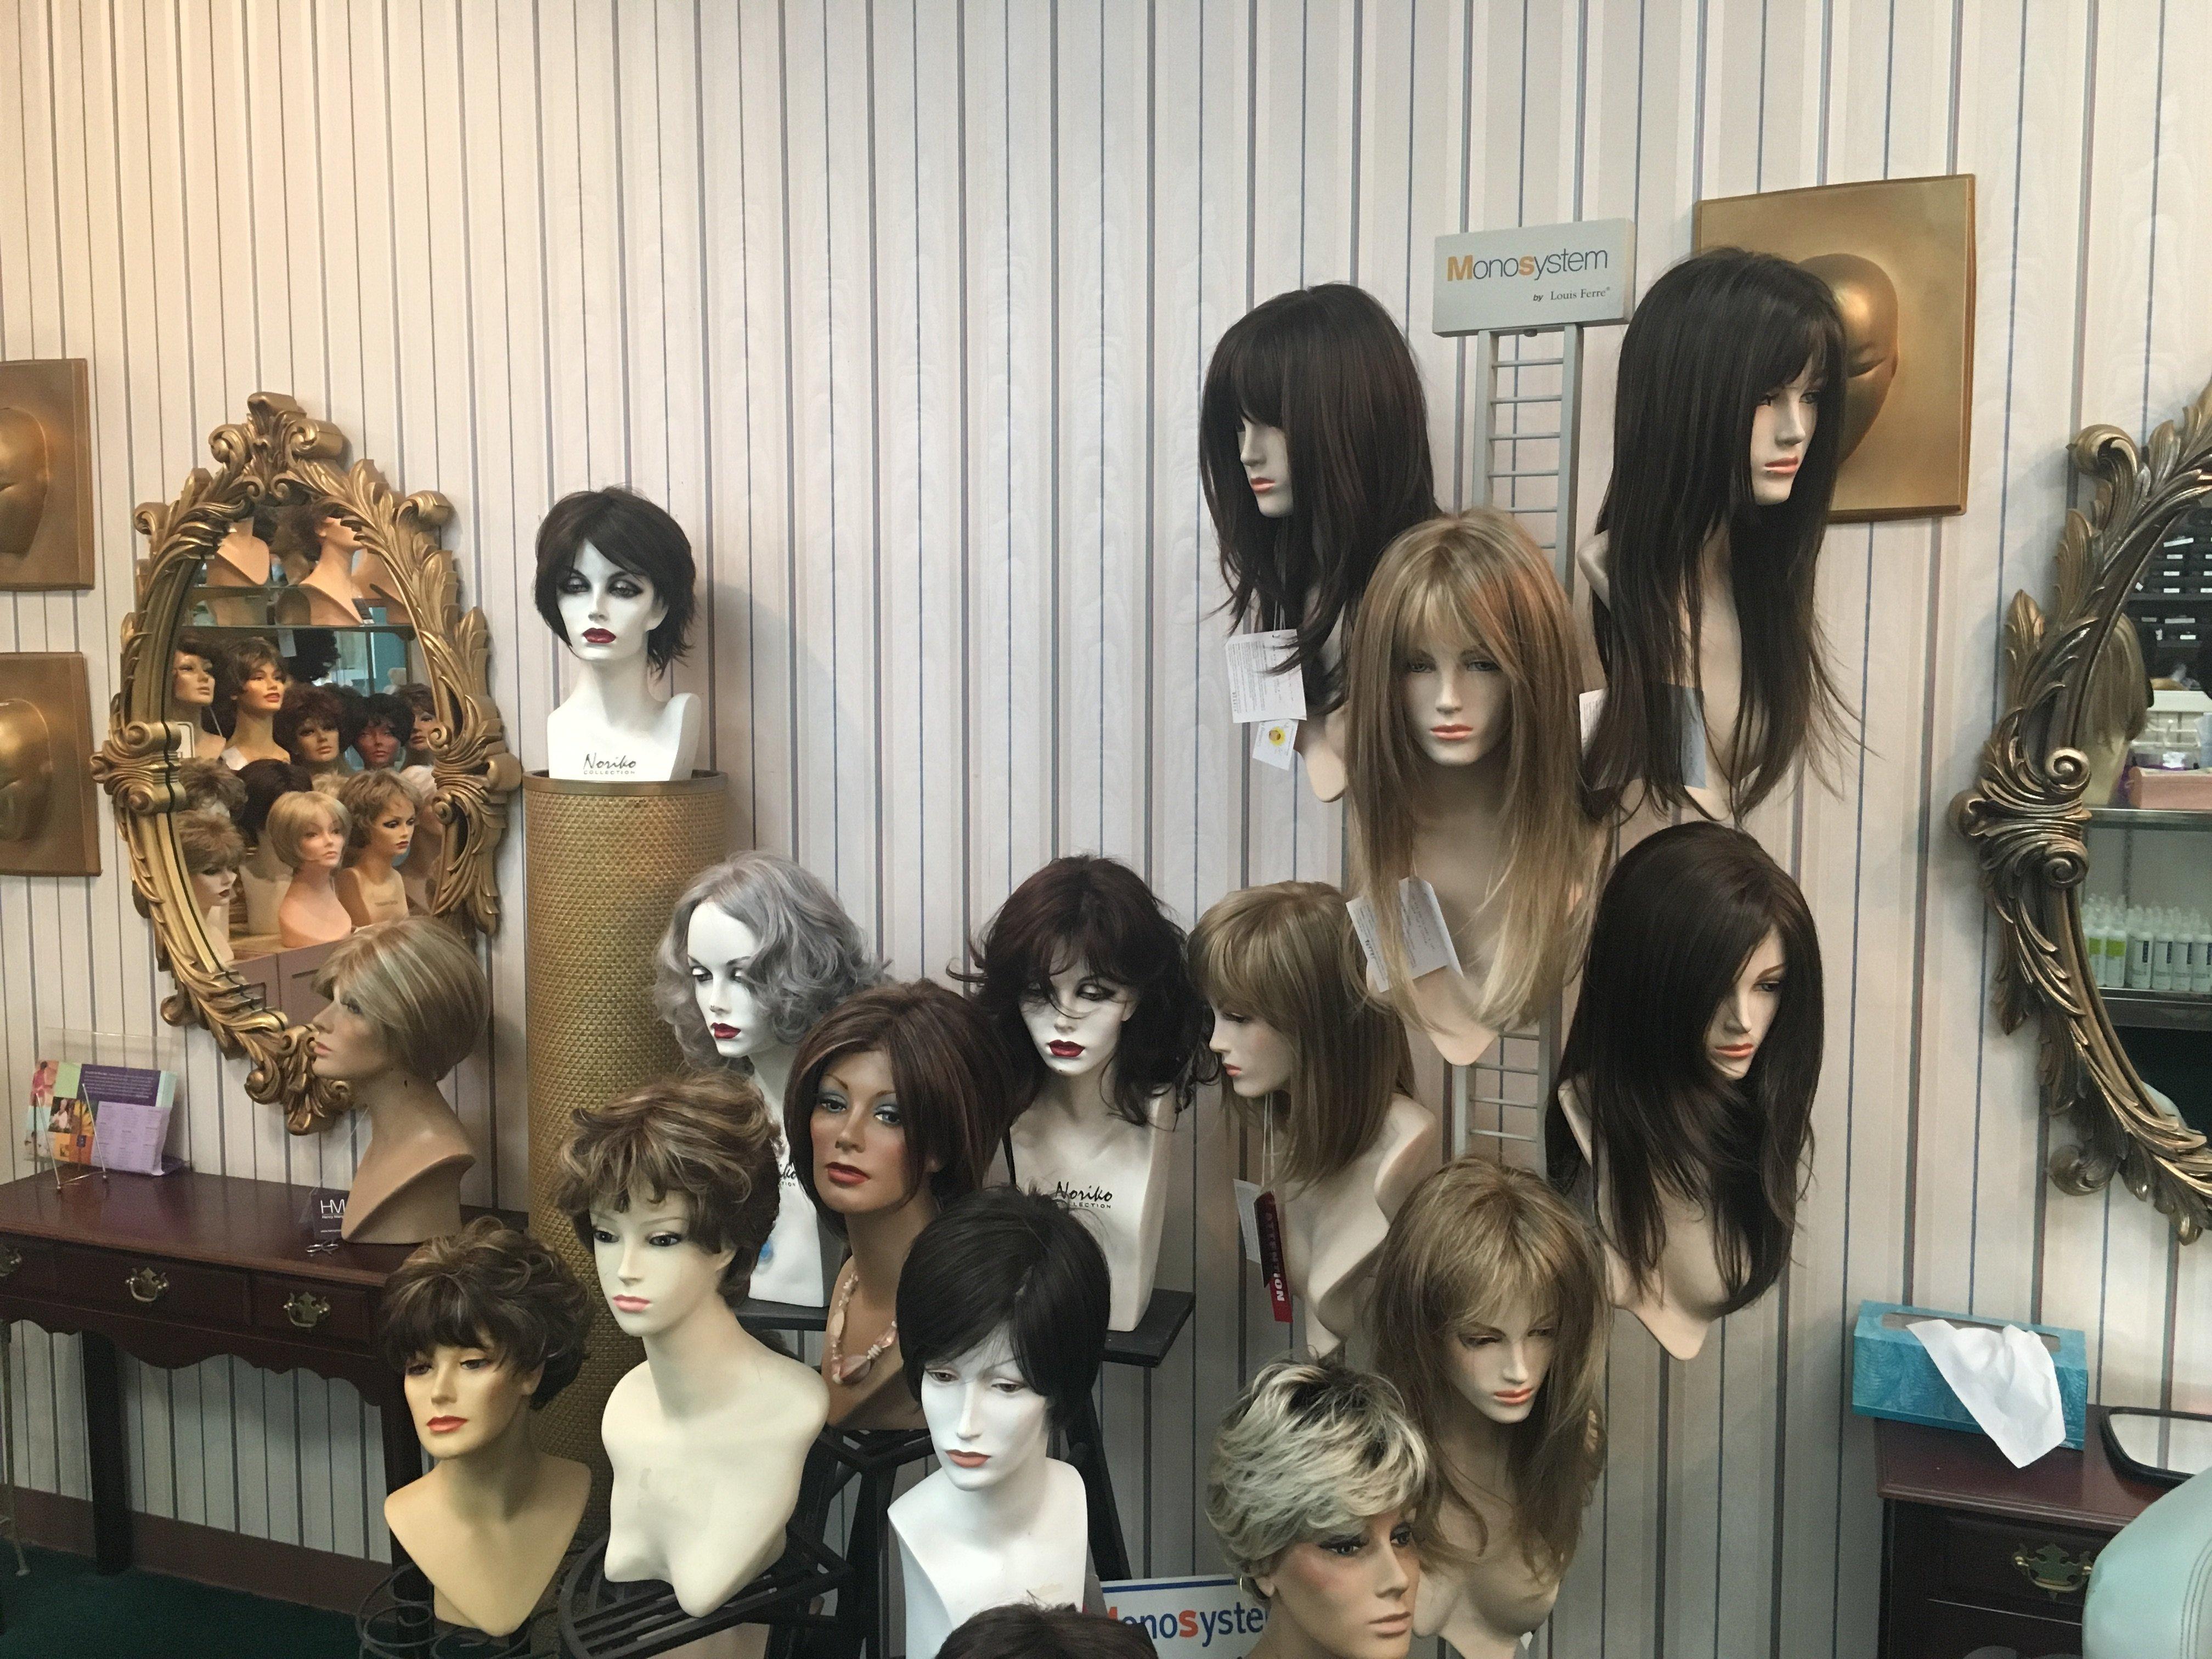 monofilament wigs, synthetic wigs & lace front wigs   Houston, TX   Ann's Wig Salon